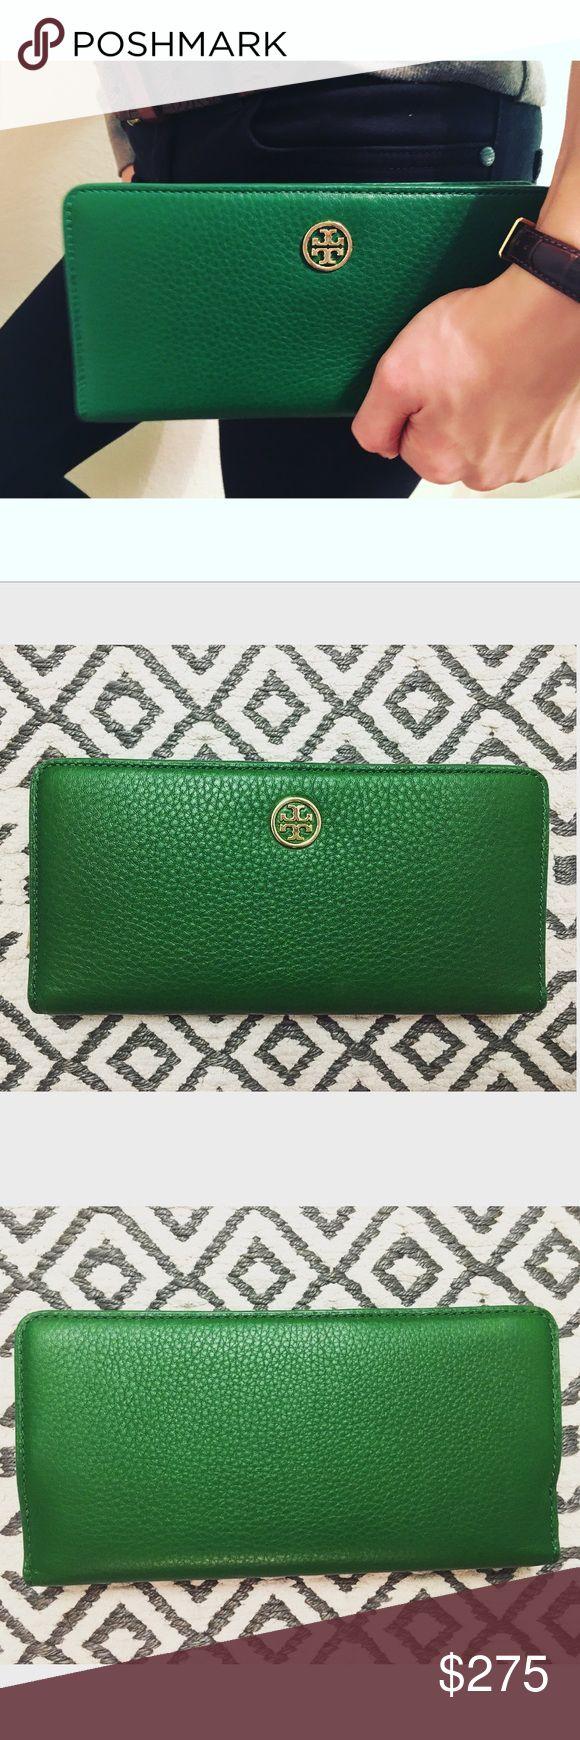 ✨Tory Burch Wallet ✨Tory Burch Wallet⚡️⭐️ Tory Burch Bags Wallets